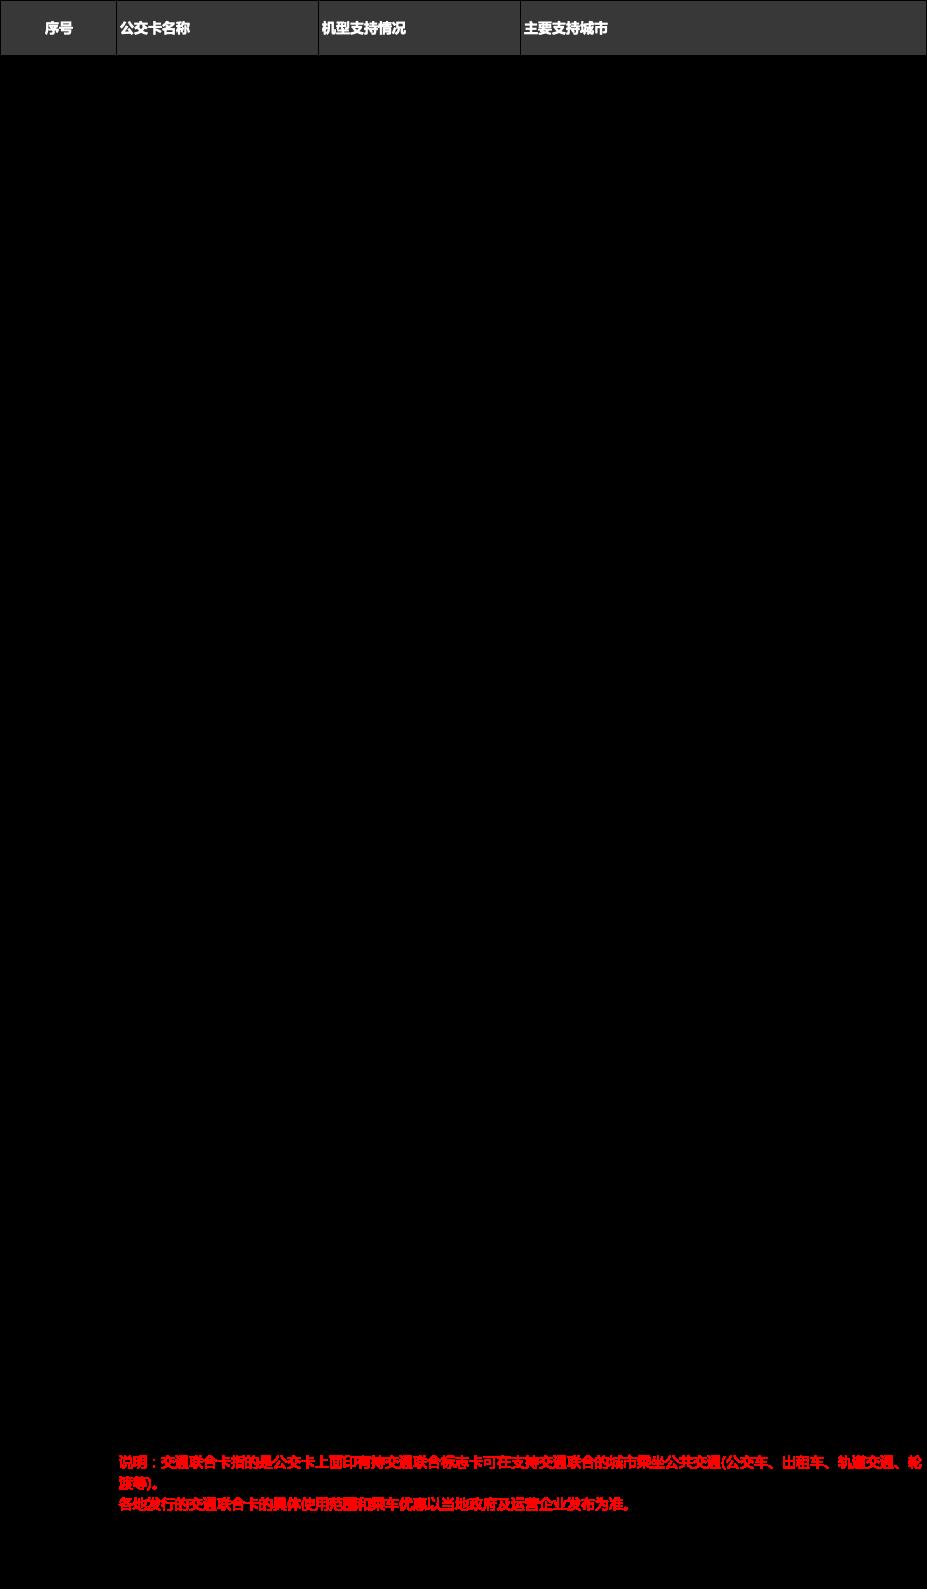 MicrosoftTeams-image (8).png